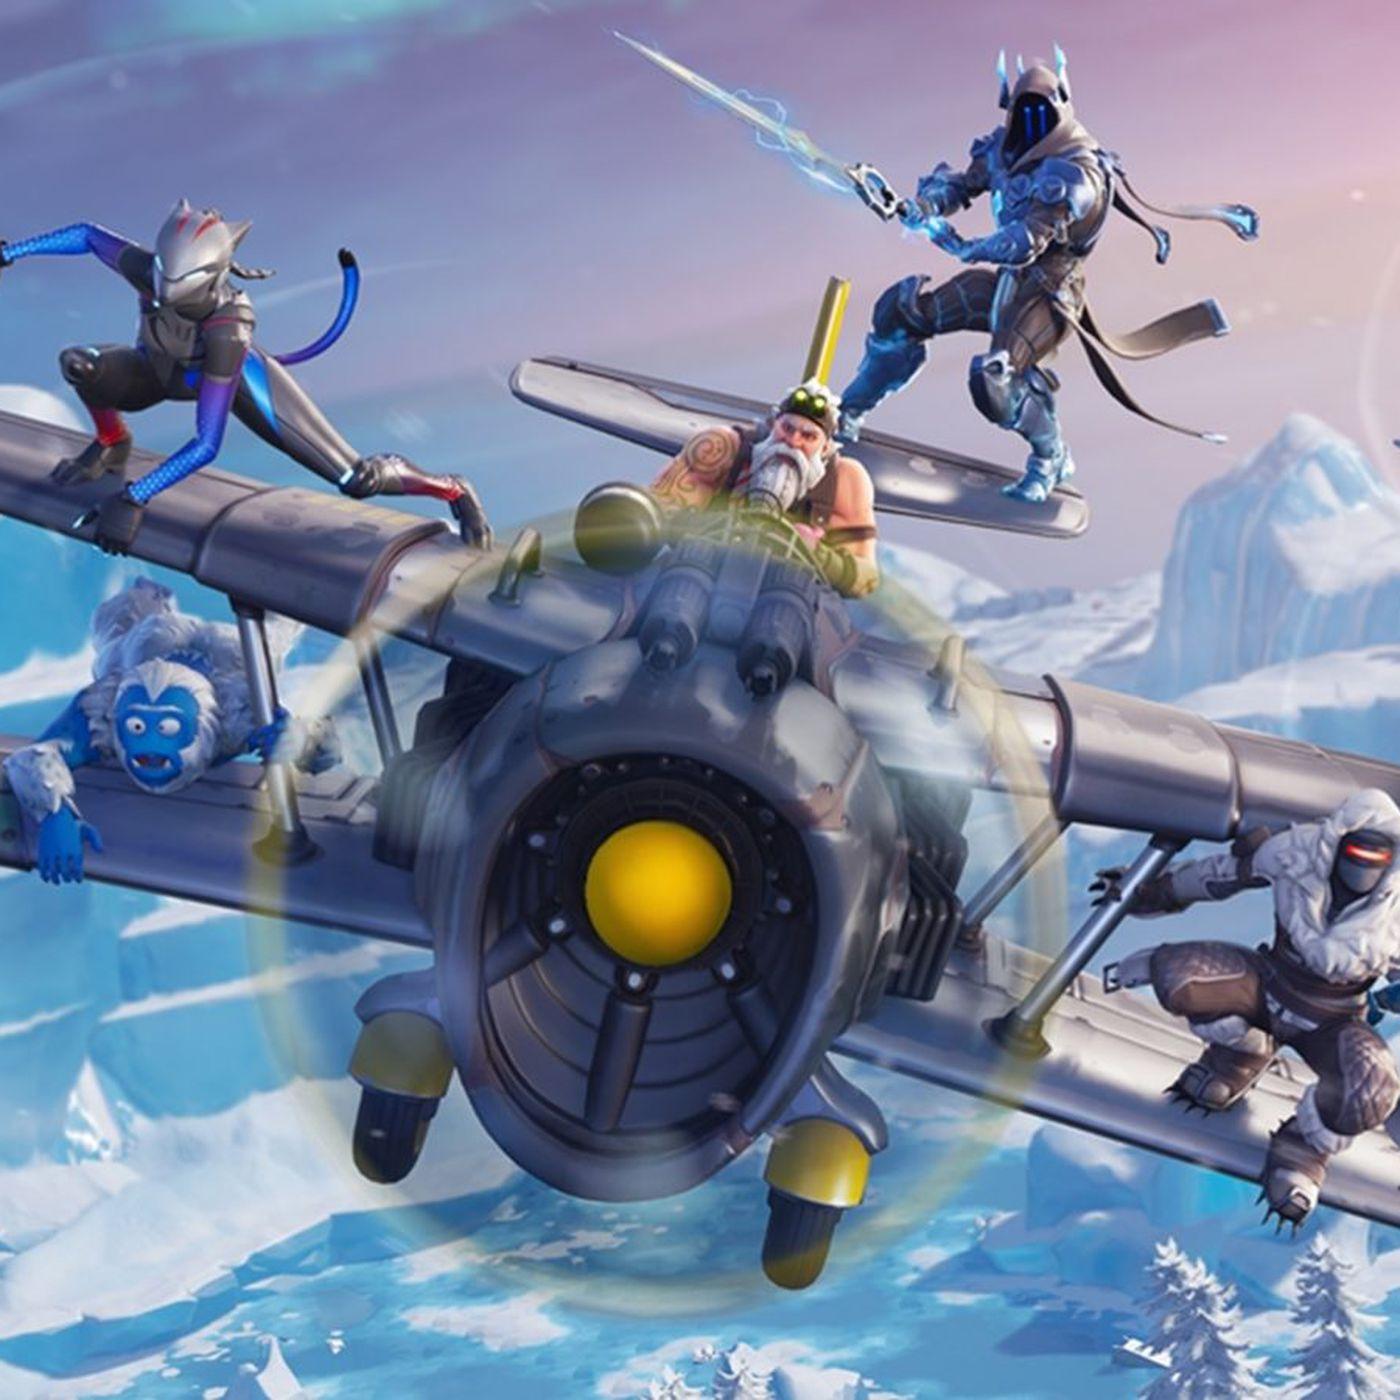 Fortnite Season 7 Brings Ziplines A Plane And New Map Updates Polygon